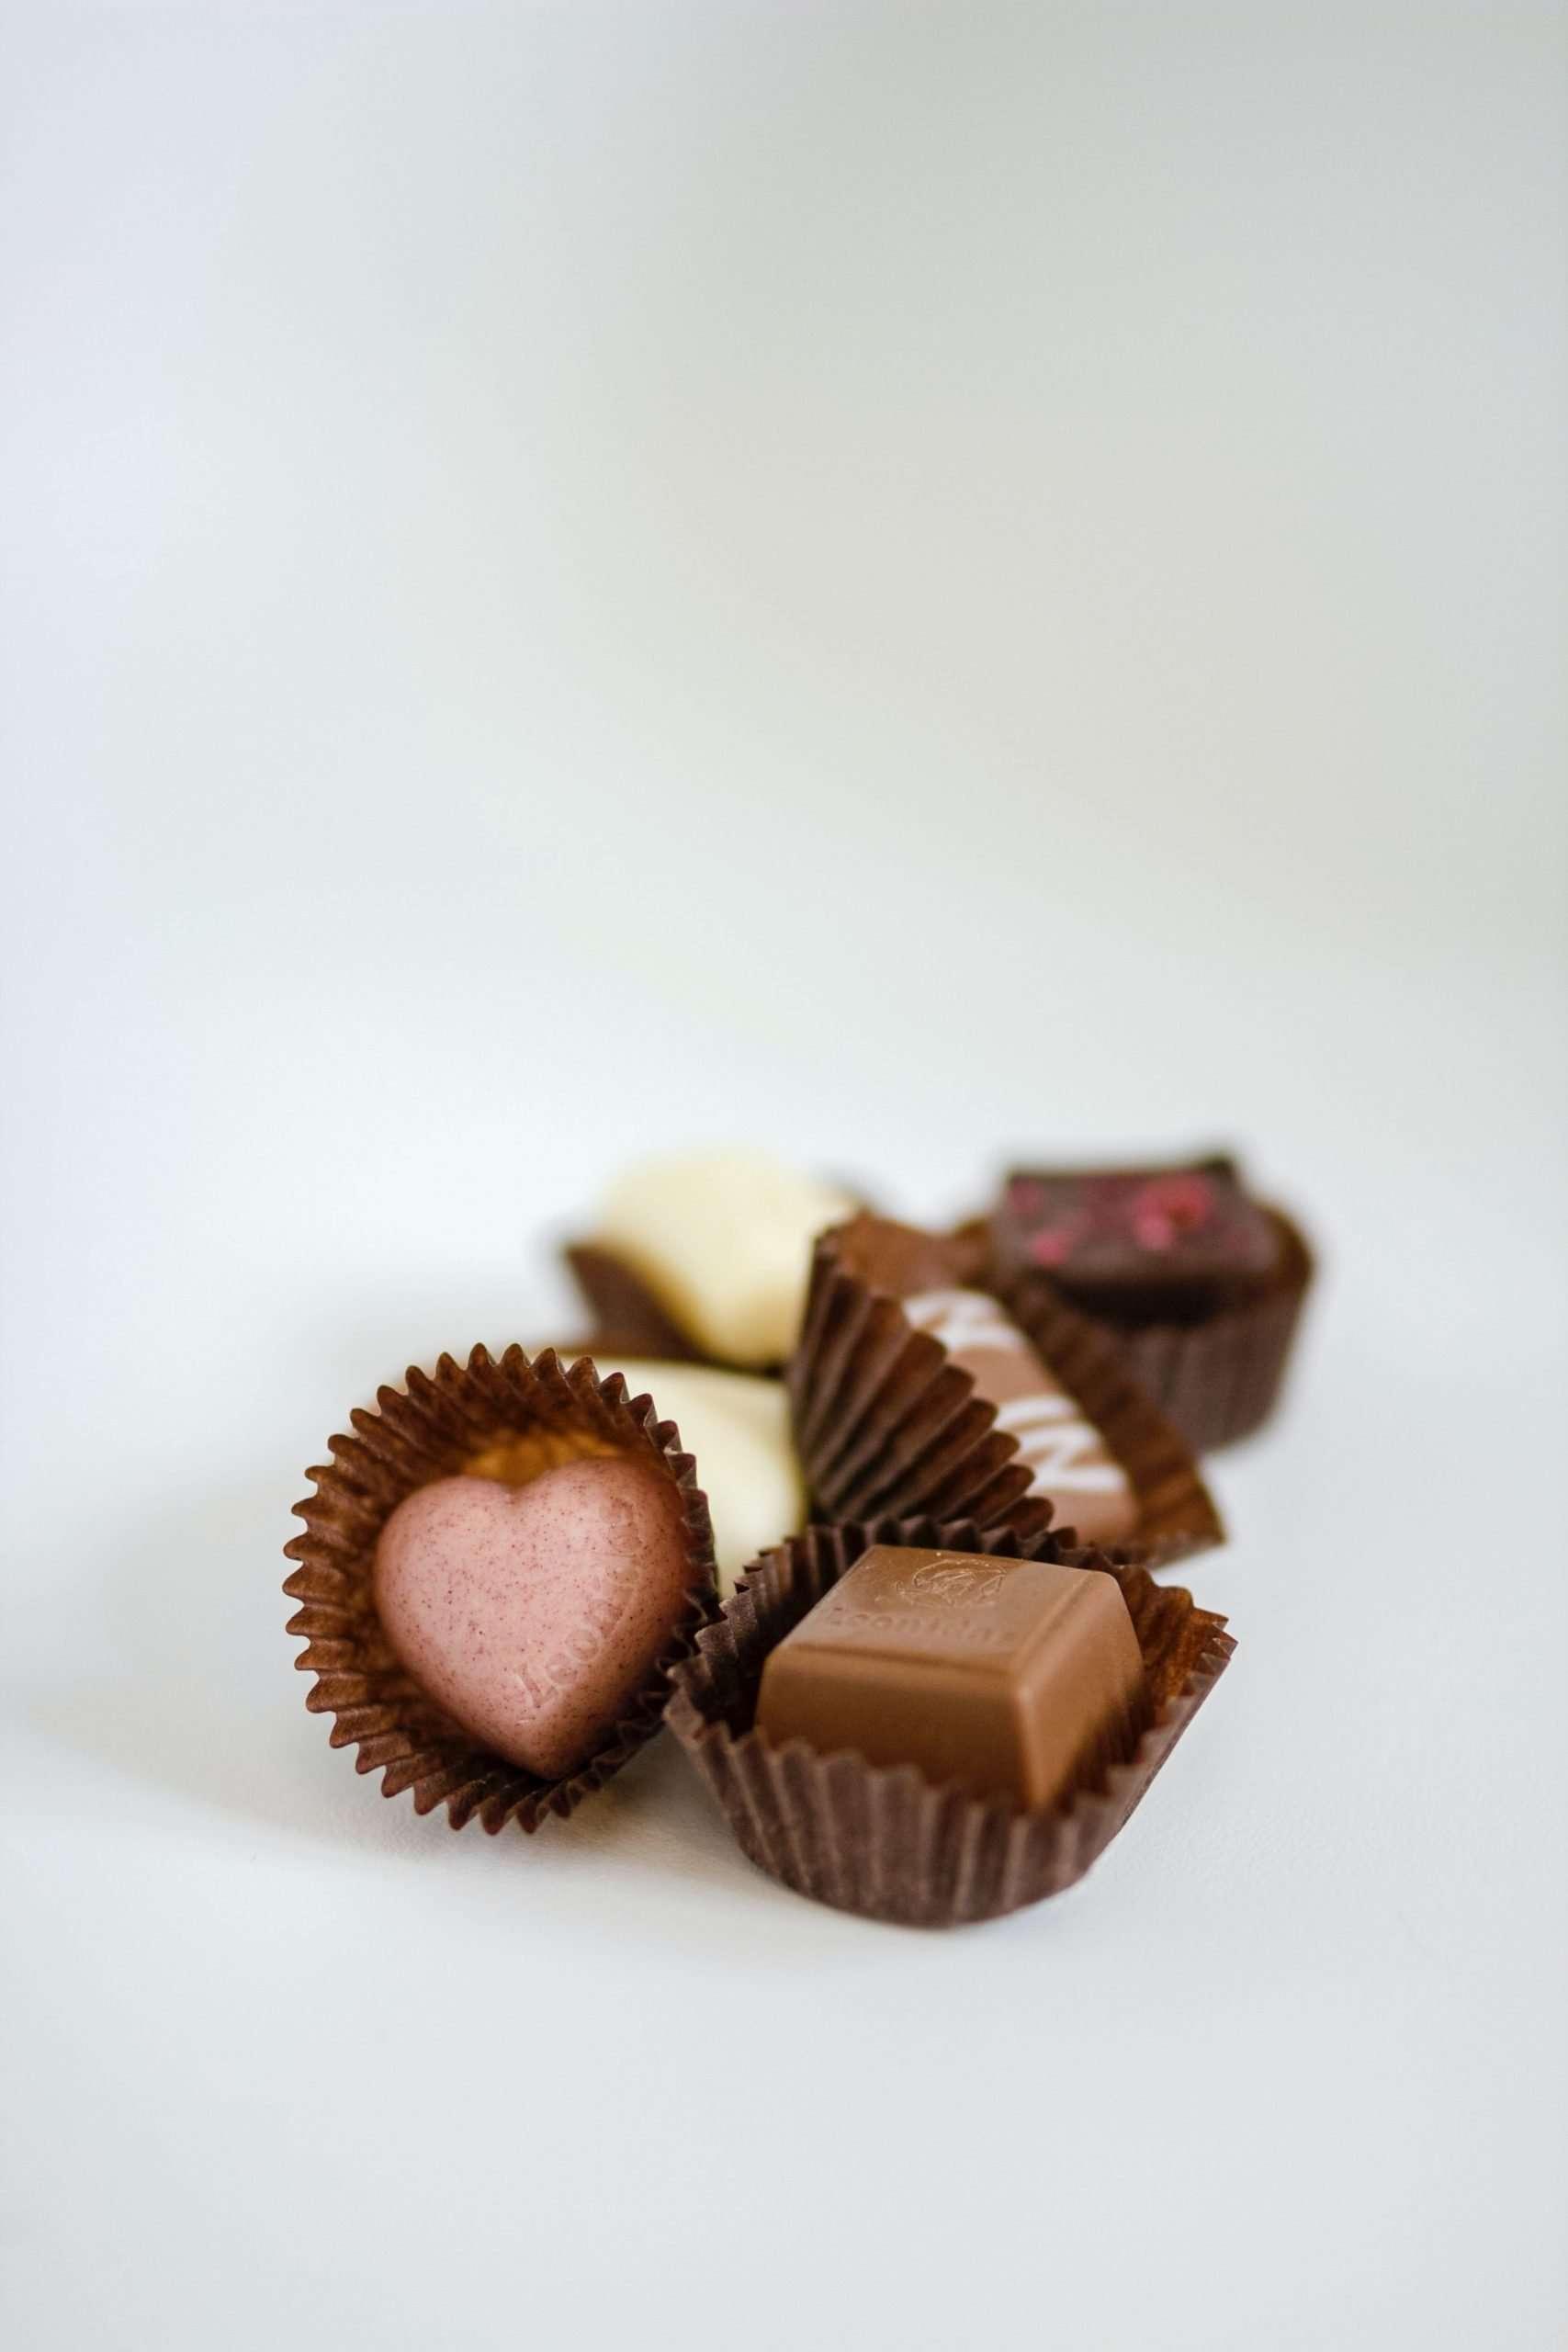 Water & Chocolate